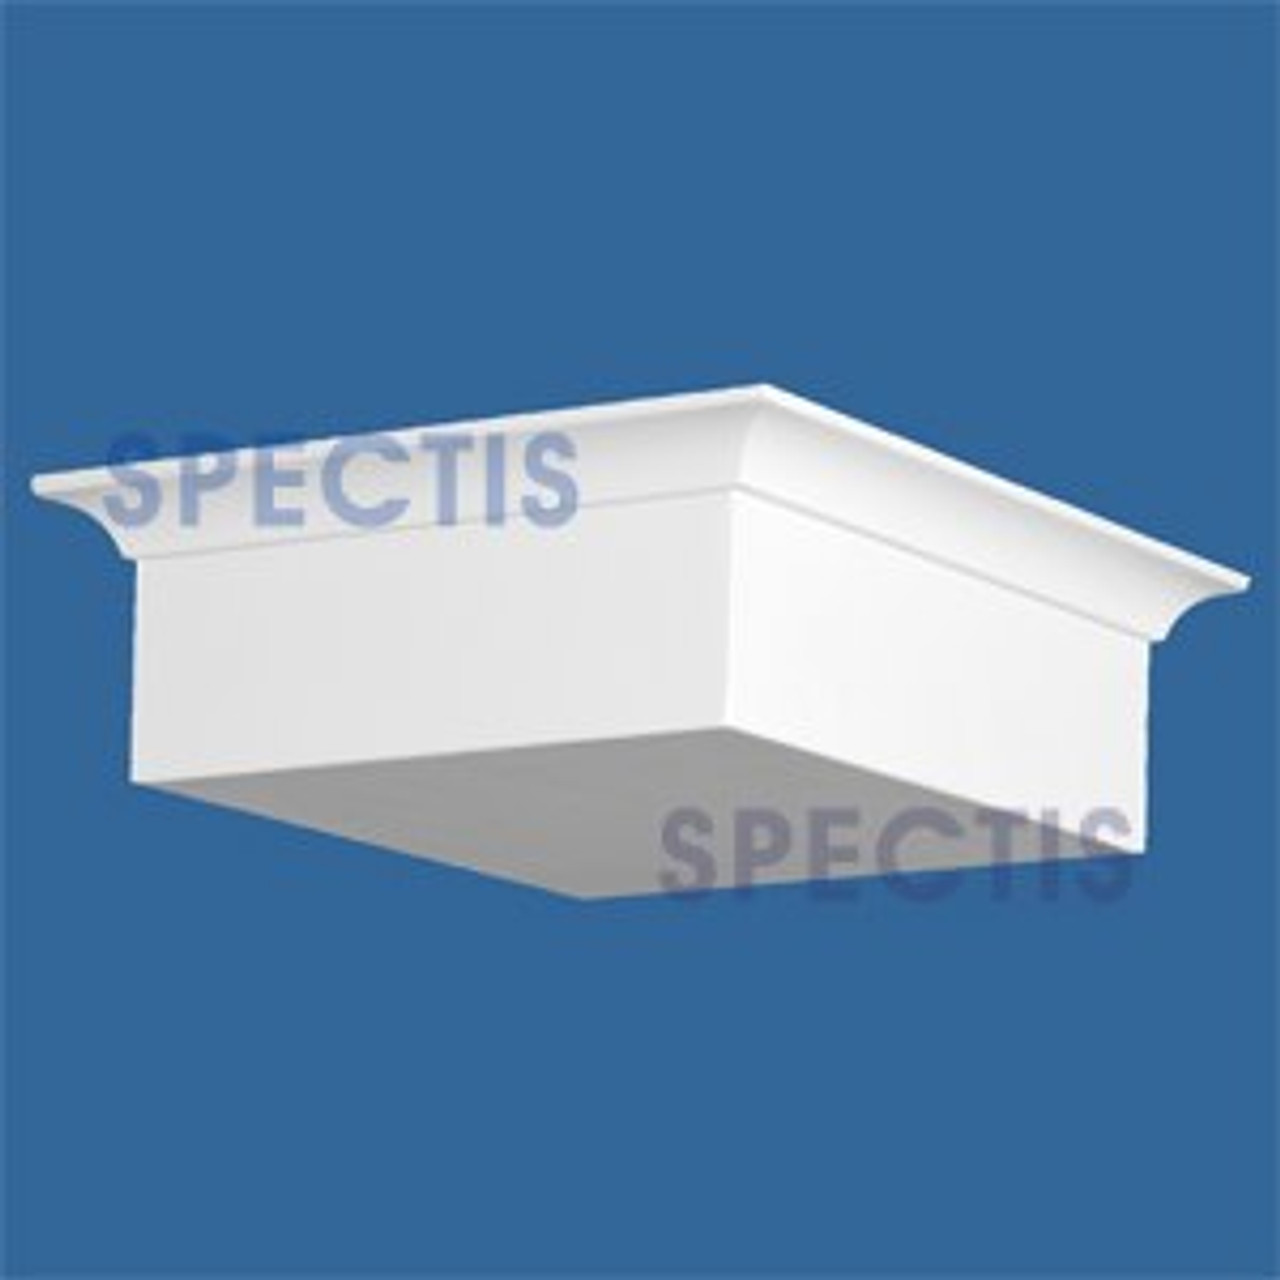 "BL2907 Corbel Block or Eave Bracket 8.5""W x 3""H x 9.5"" P"